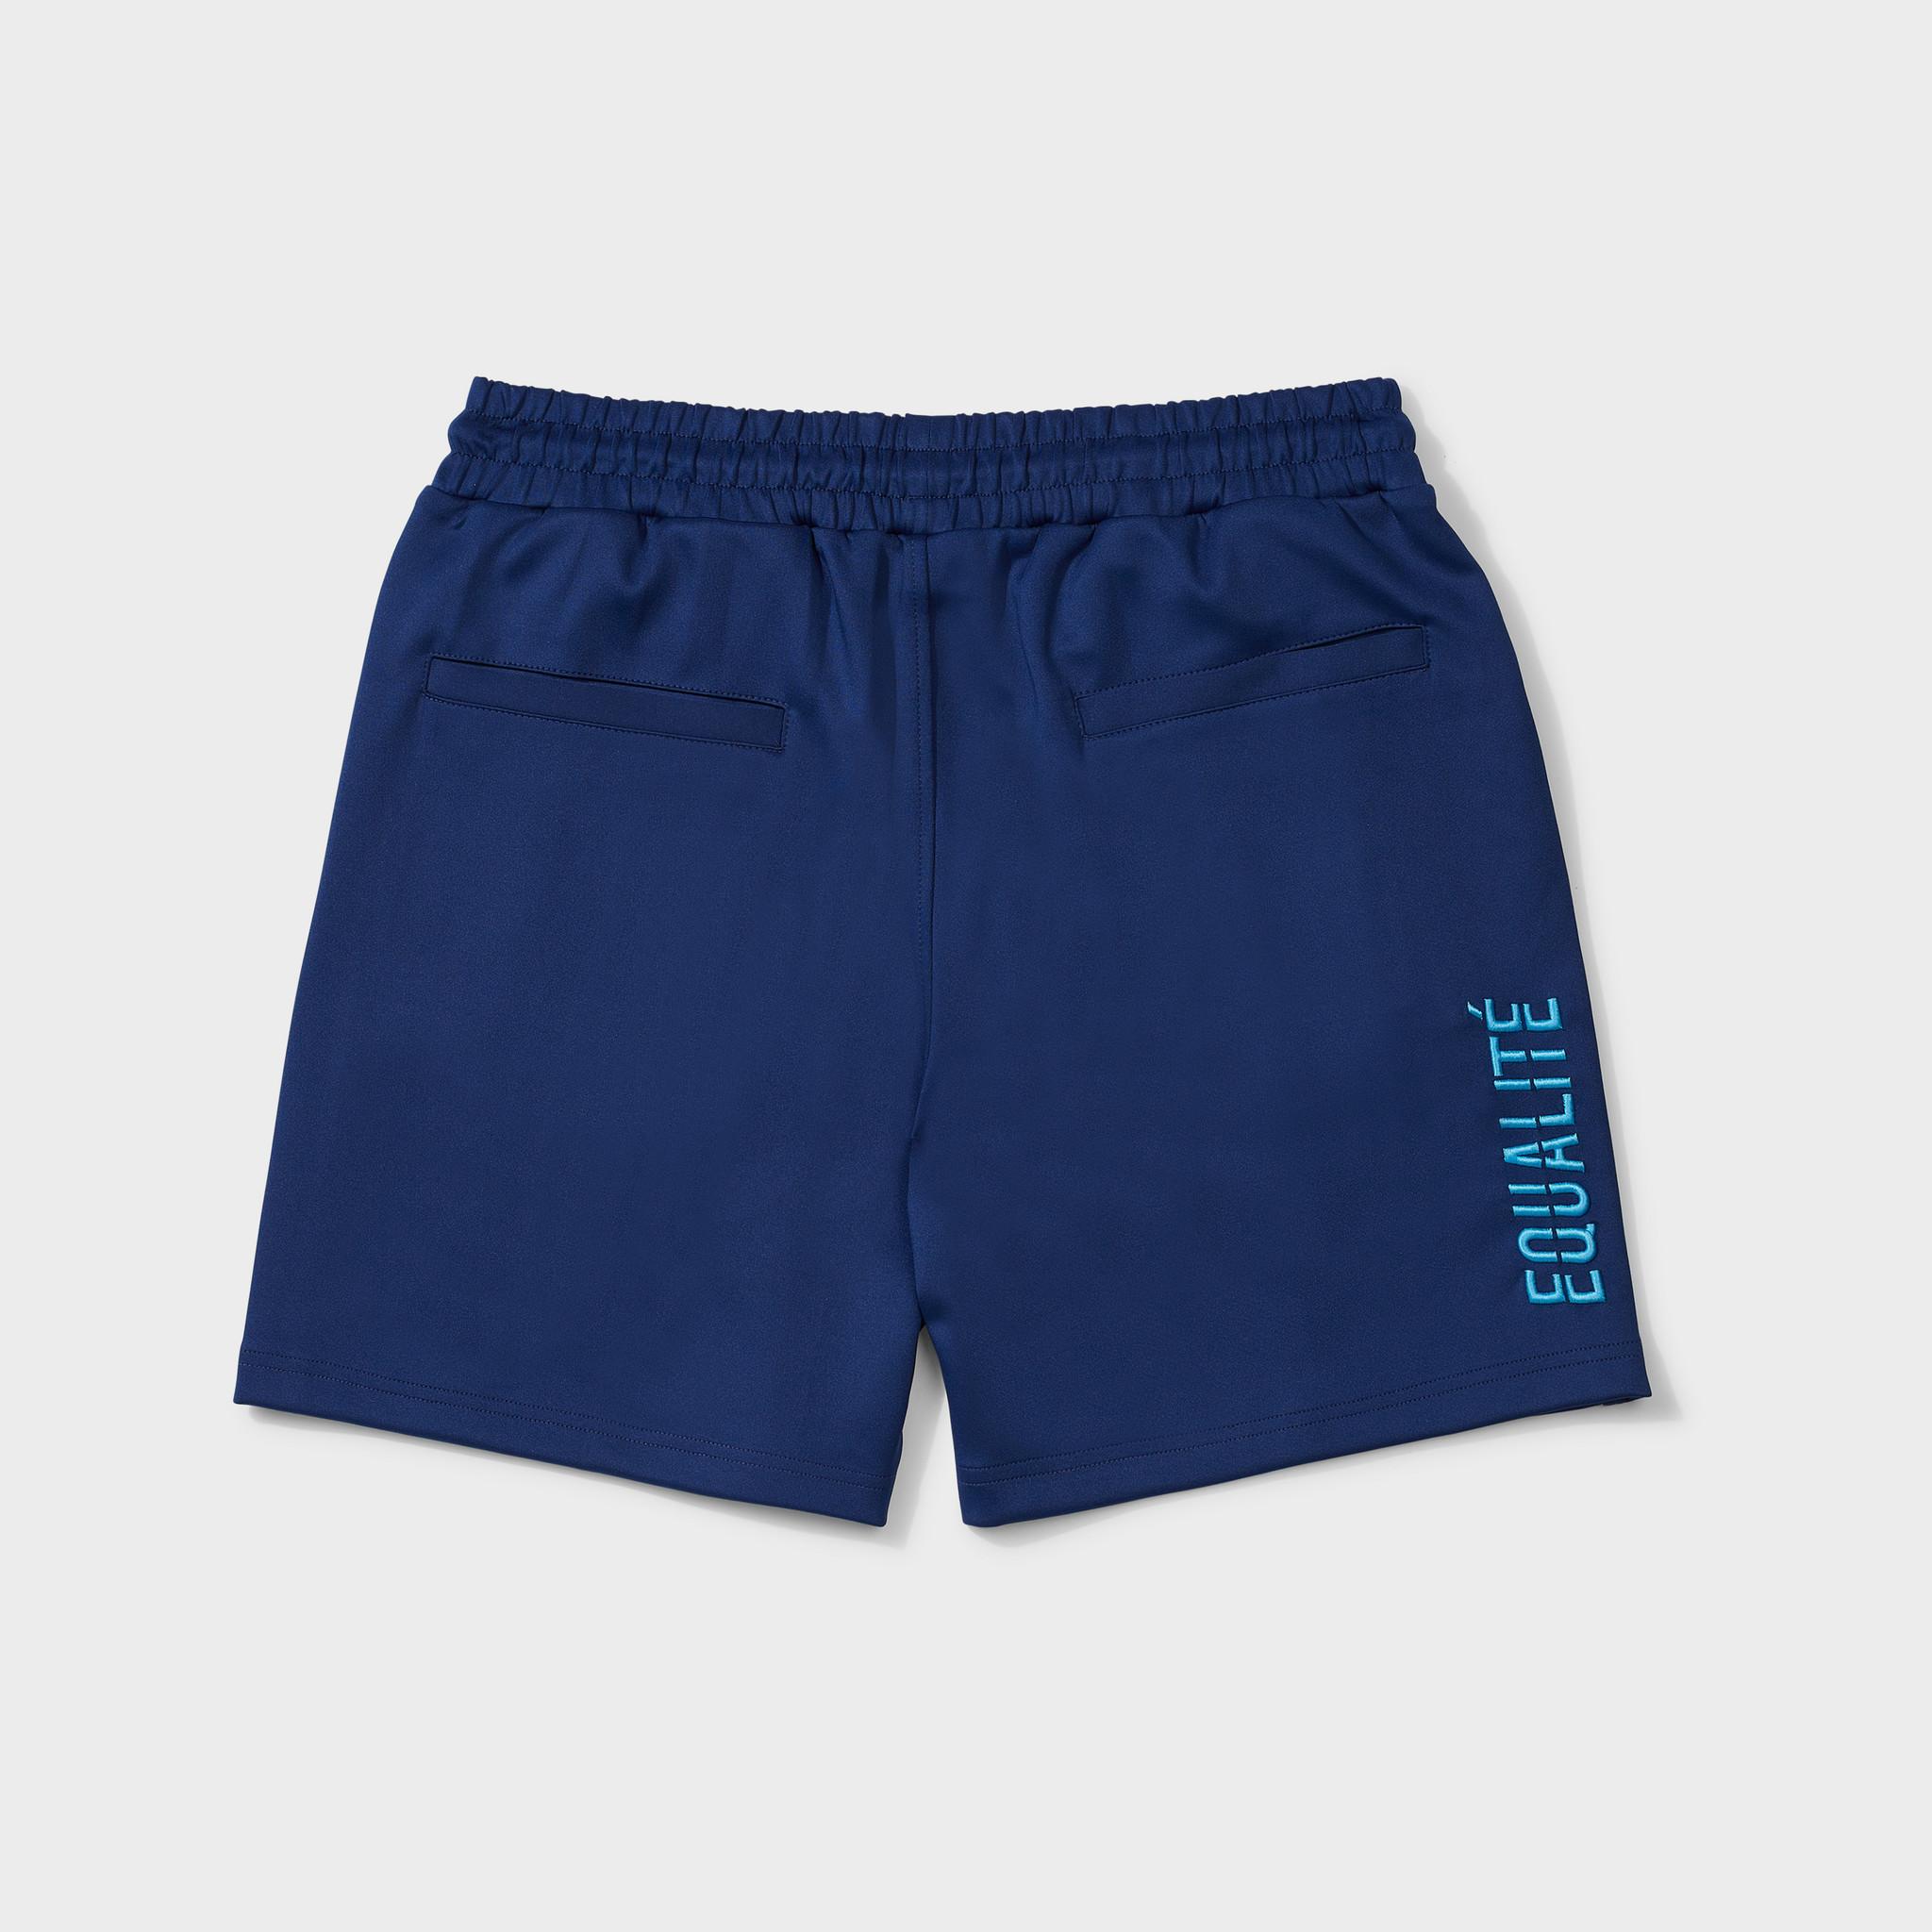 Demir carbon shorts navy-2